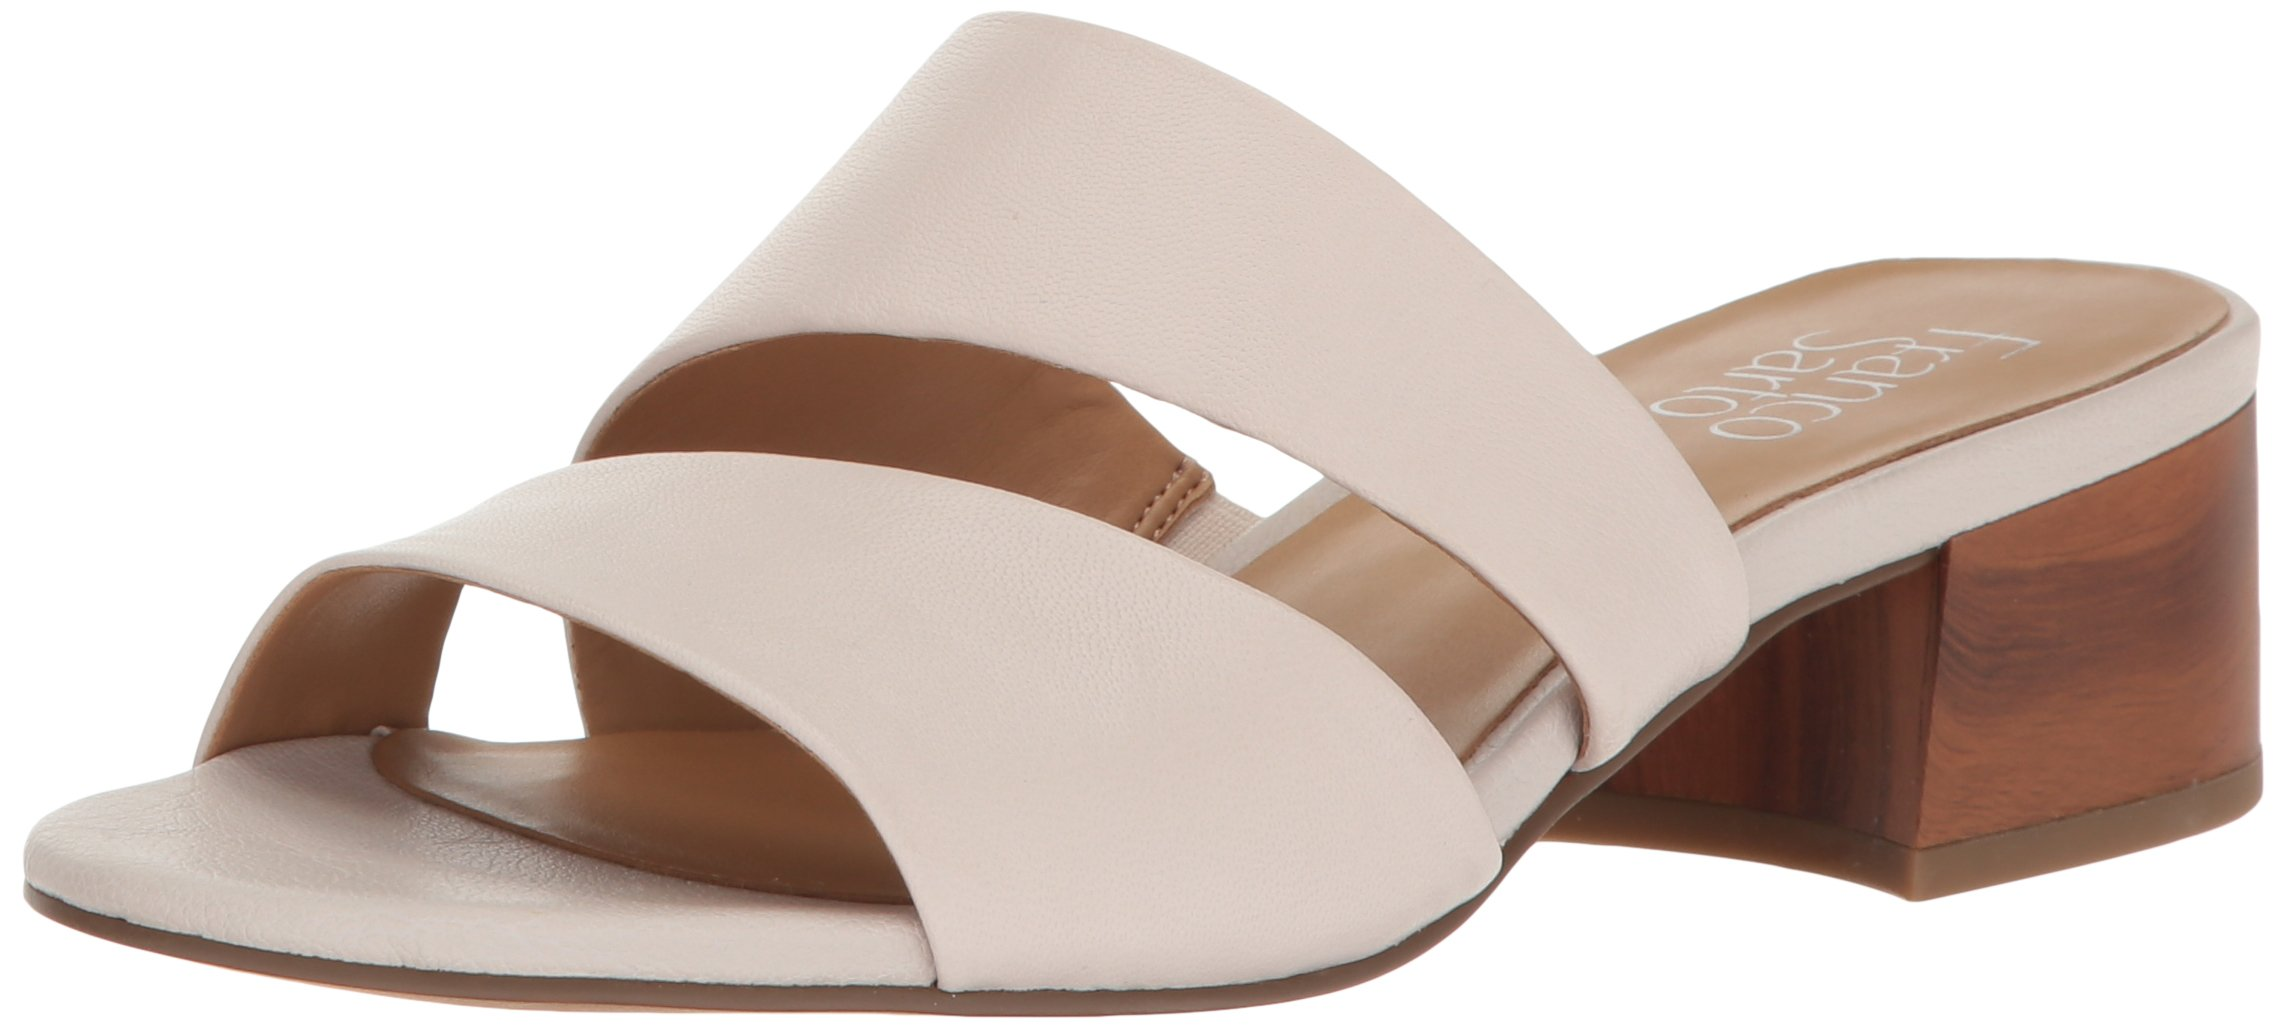 Franco Sarto Women's Tallen Heeled Sandal, White, 9 Medium US